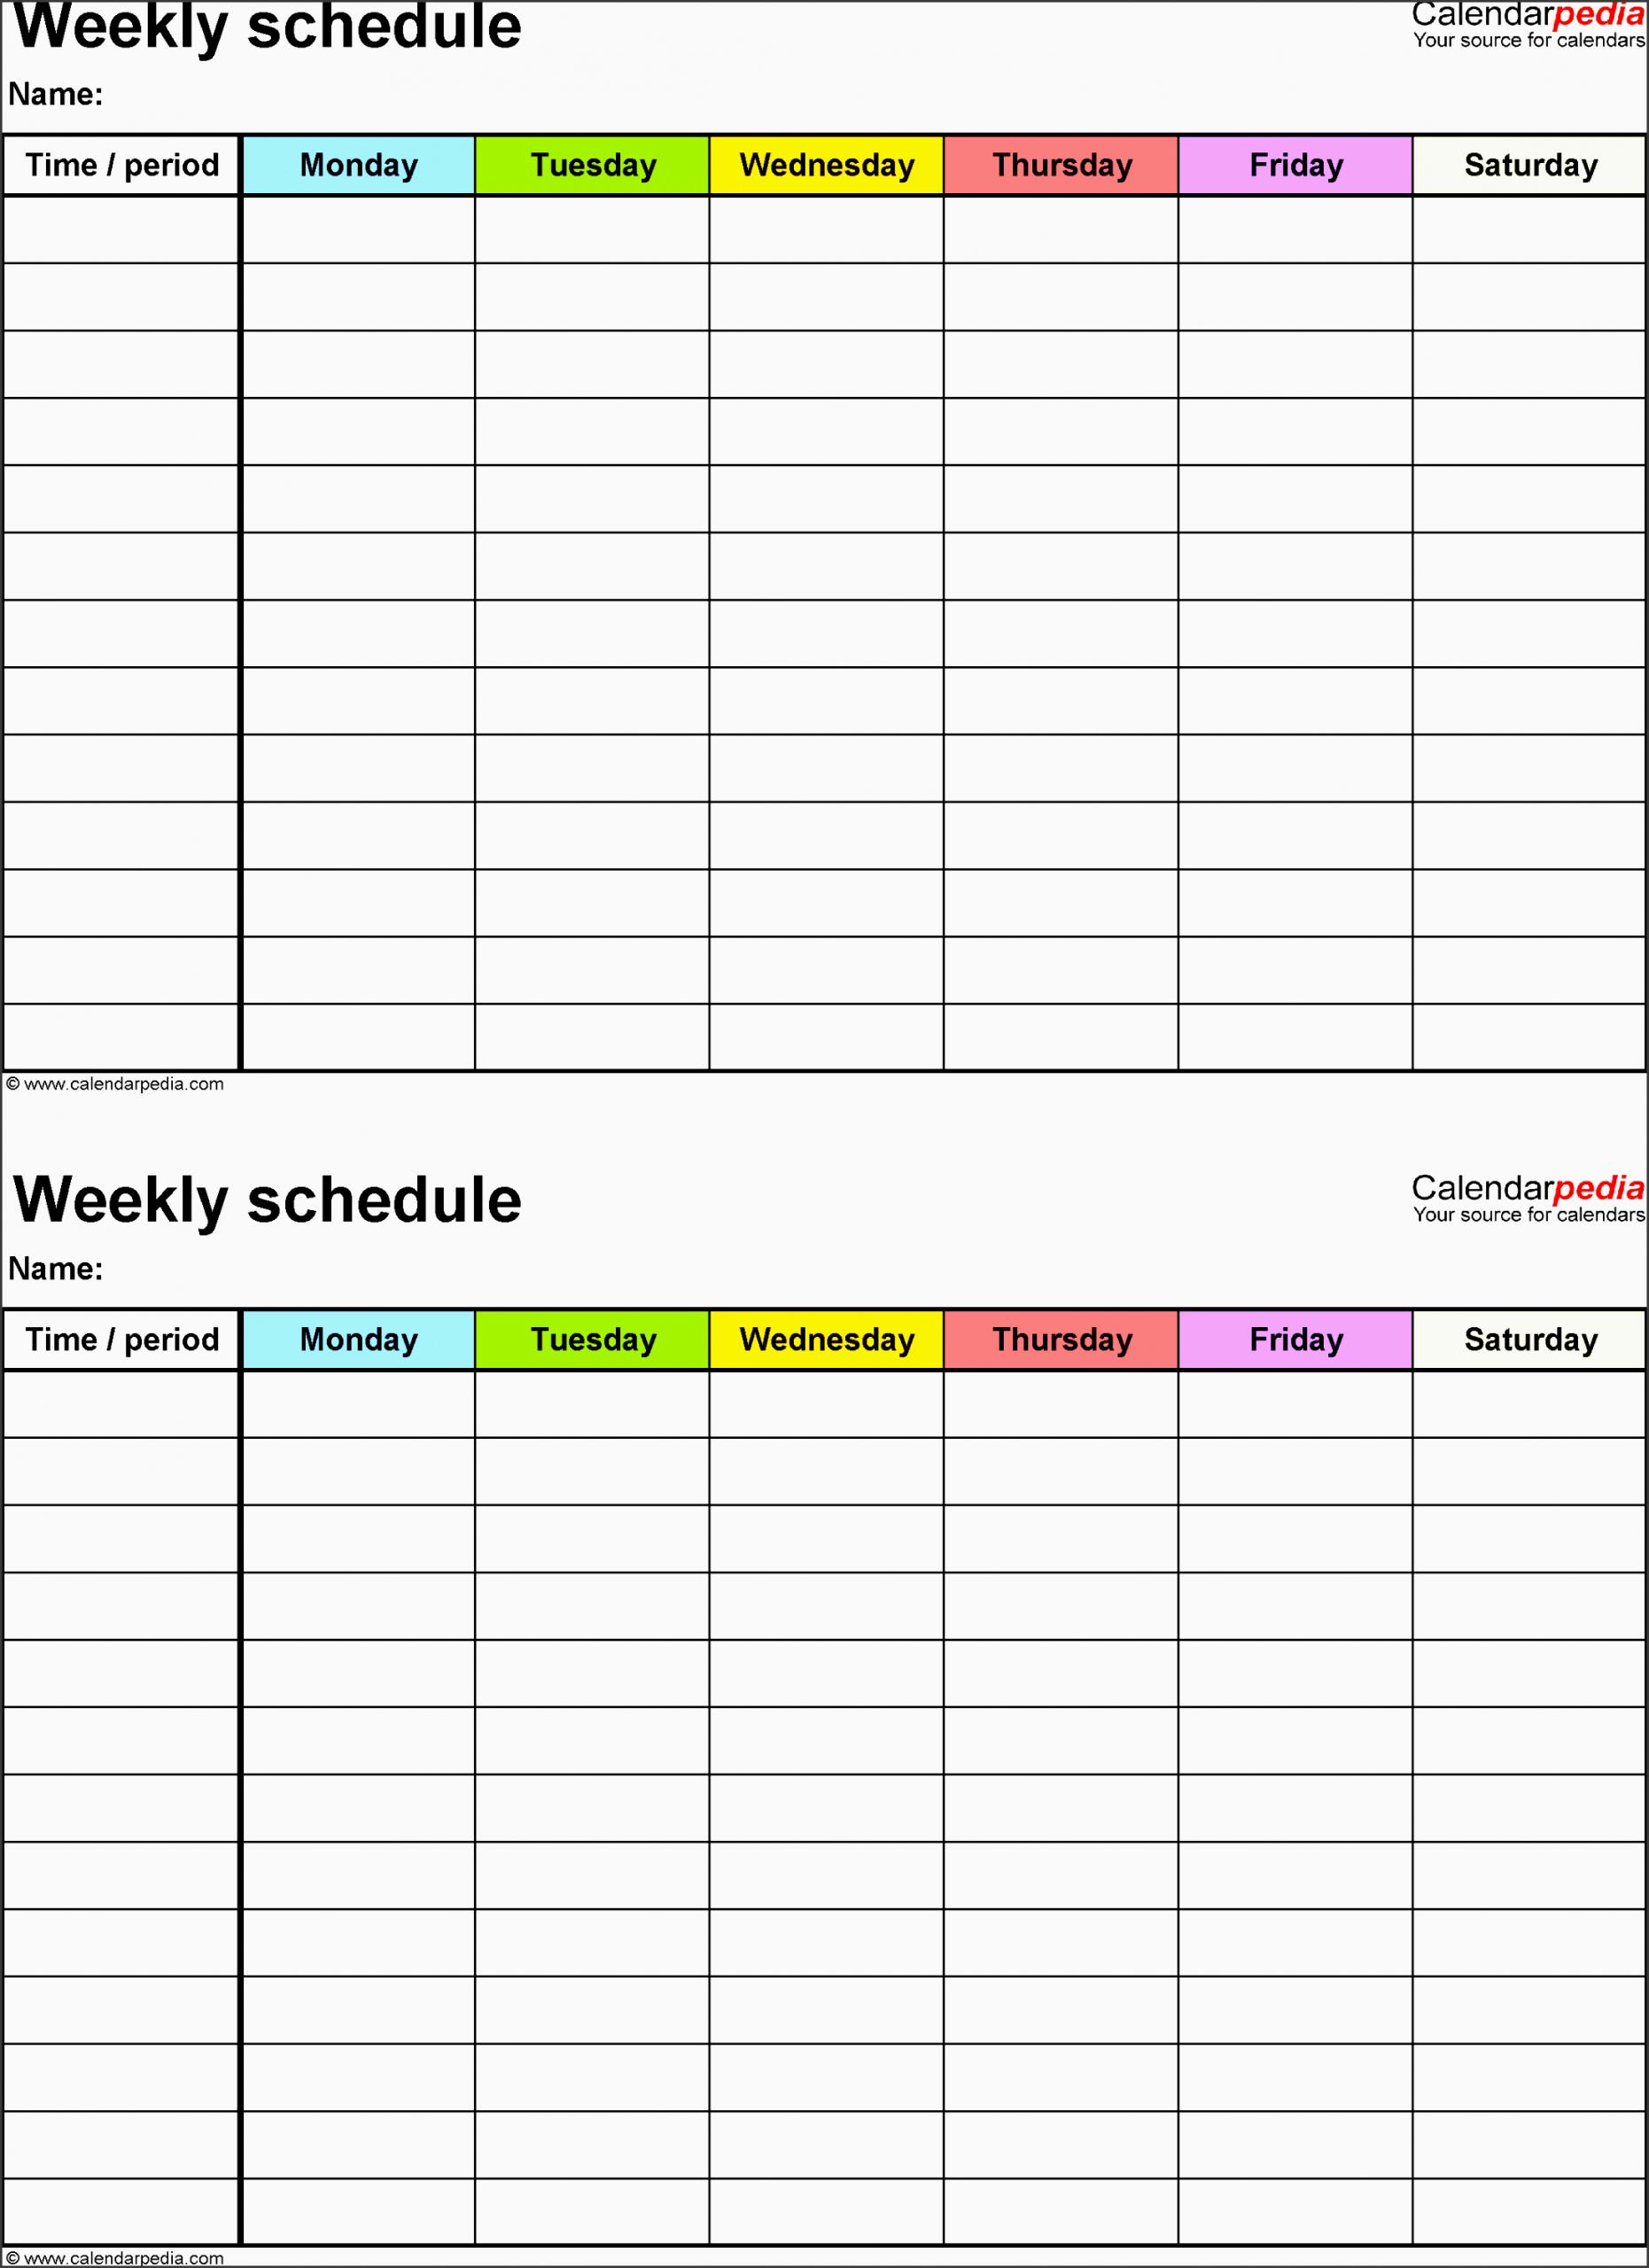 7 Employee Weekly Time Planner - Sampletemplatess Two Week Calendar Pdf